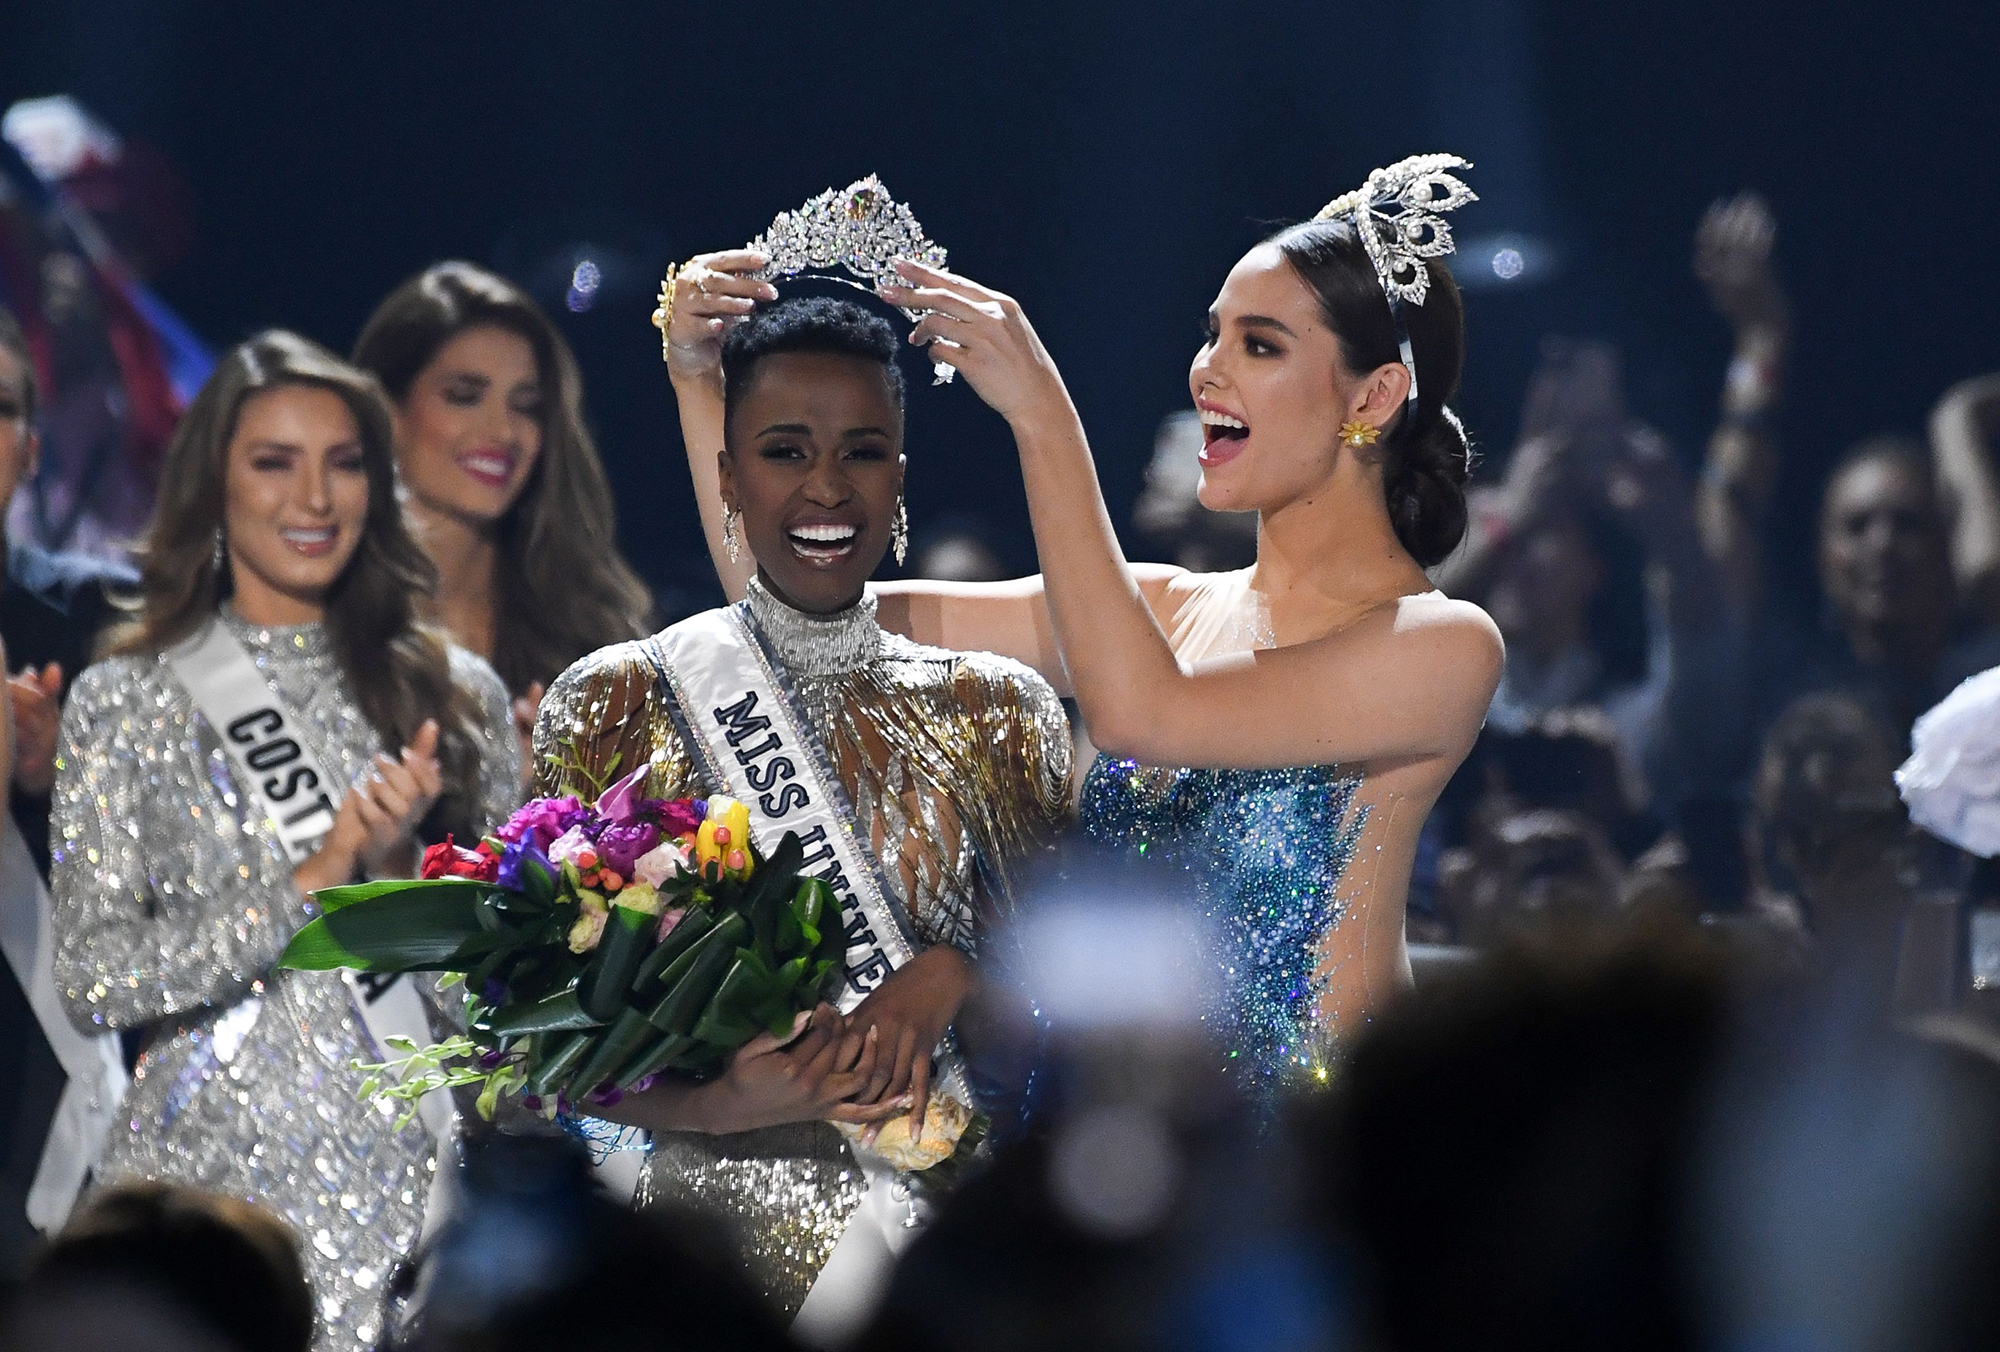 Miss Universe 2018 Philippines crowns the new Miss Universe 2019 Zozibini Tunzi (Credit: VALERIE MACON/Getty )